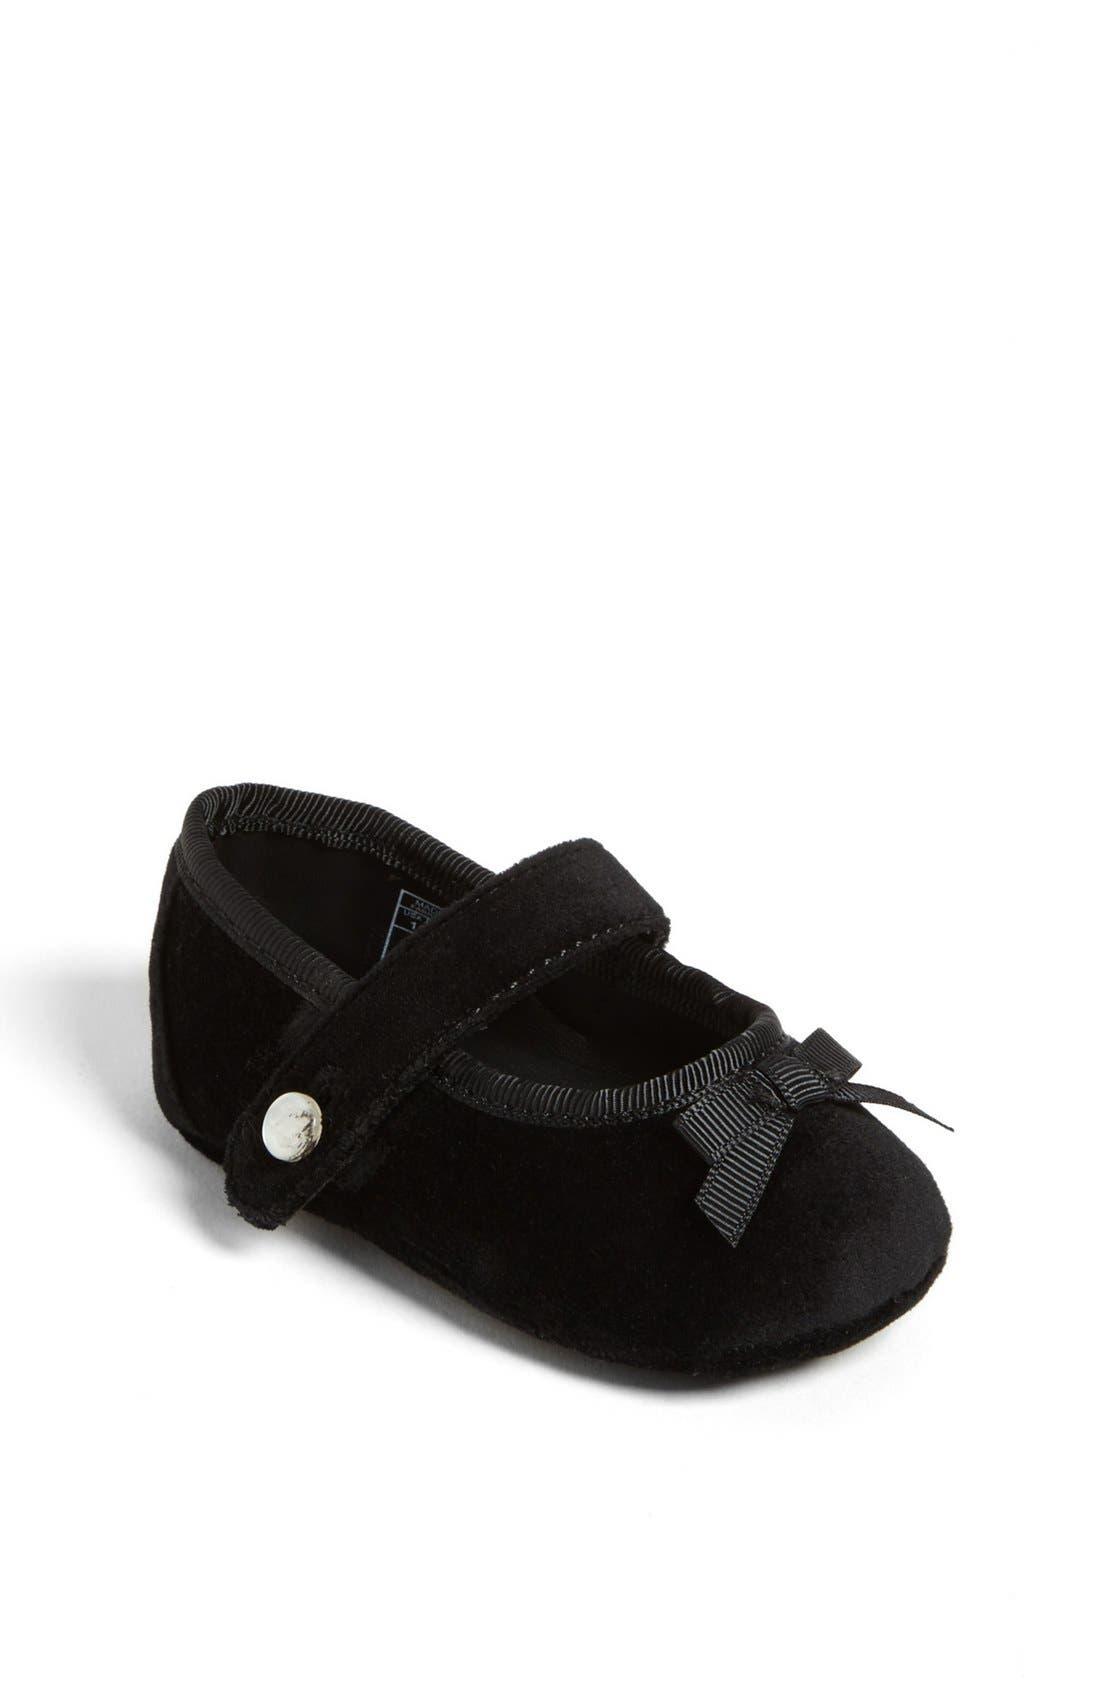 Alternate Image 1 Selected - Ralph Lauren Crib Shoe (Baby)